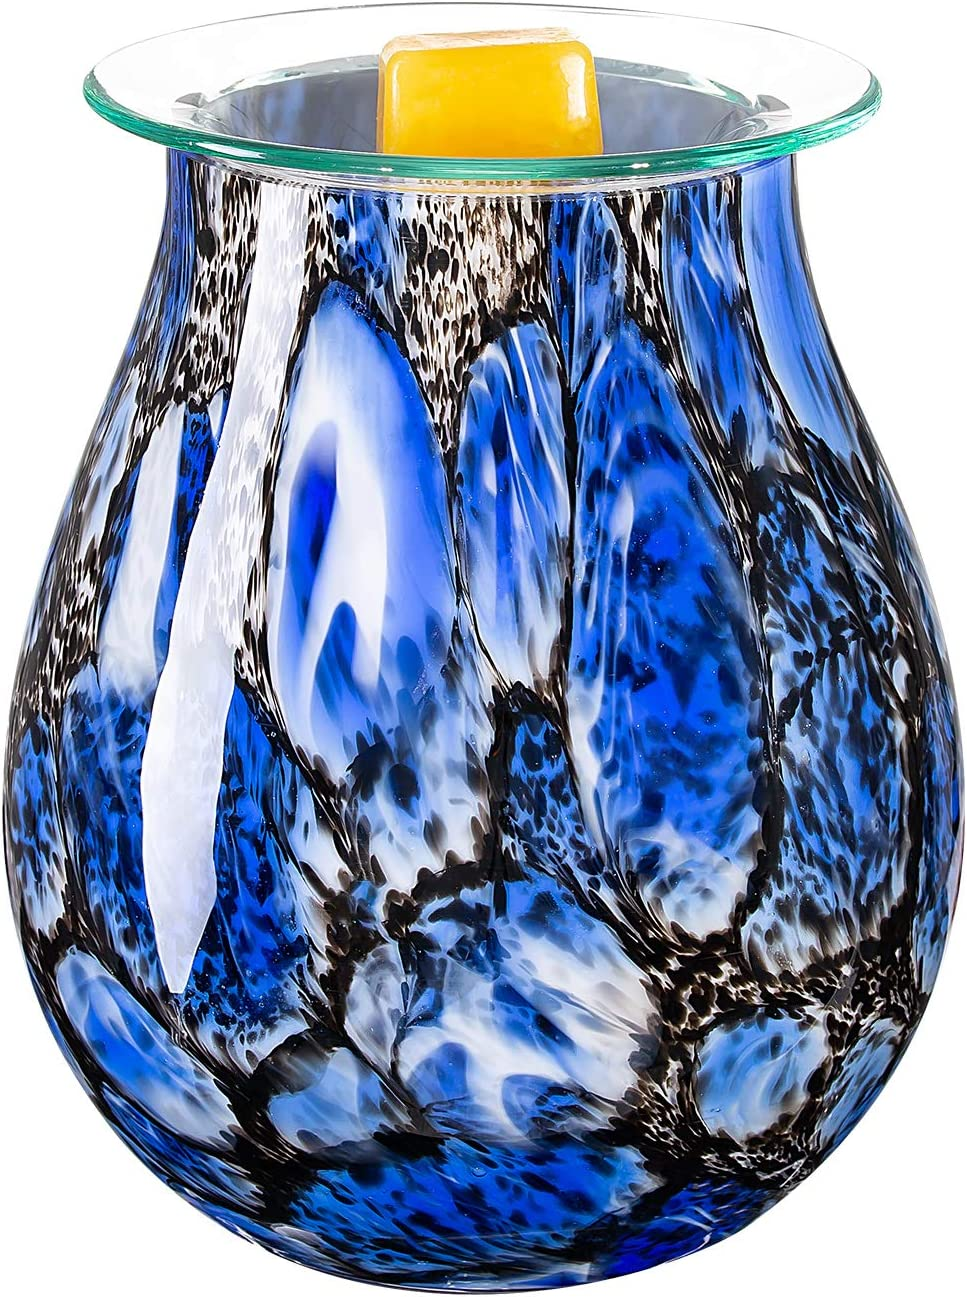 COOSA Art Glass Wax Melt Warmer-Electric Candle Warmer,Incense Wax Tart Burner Fragrance Night Light Aroma Decorative for Home Office (Blue)